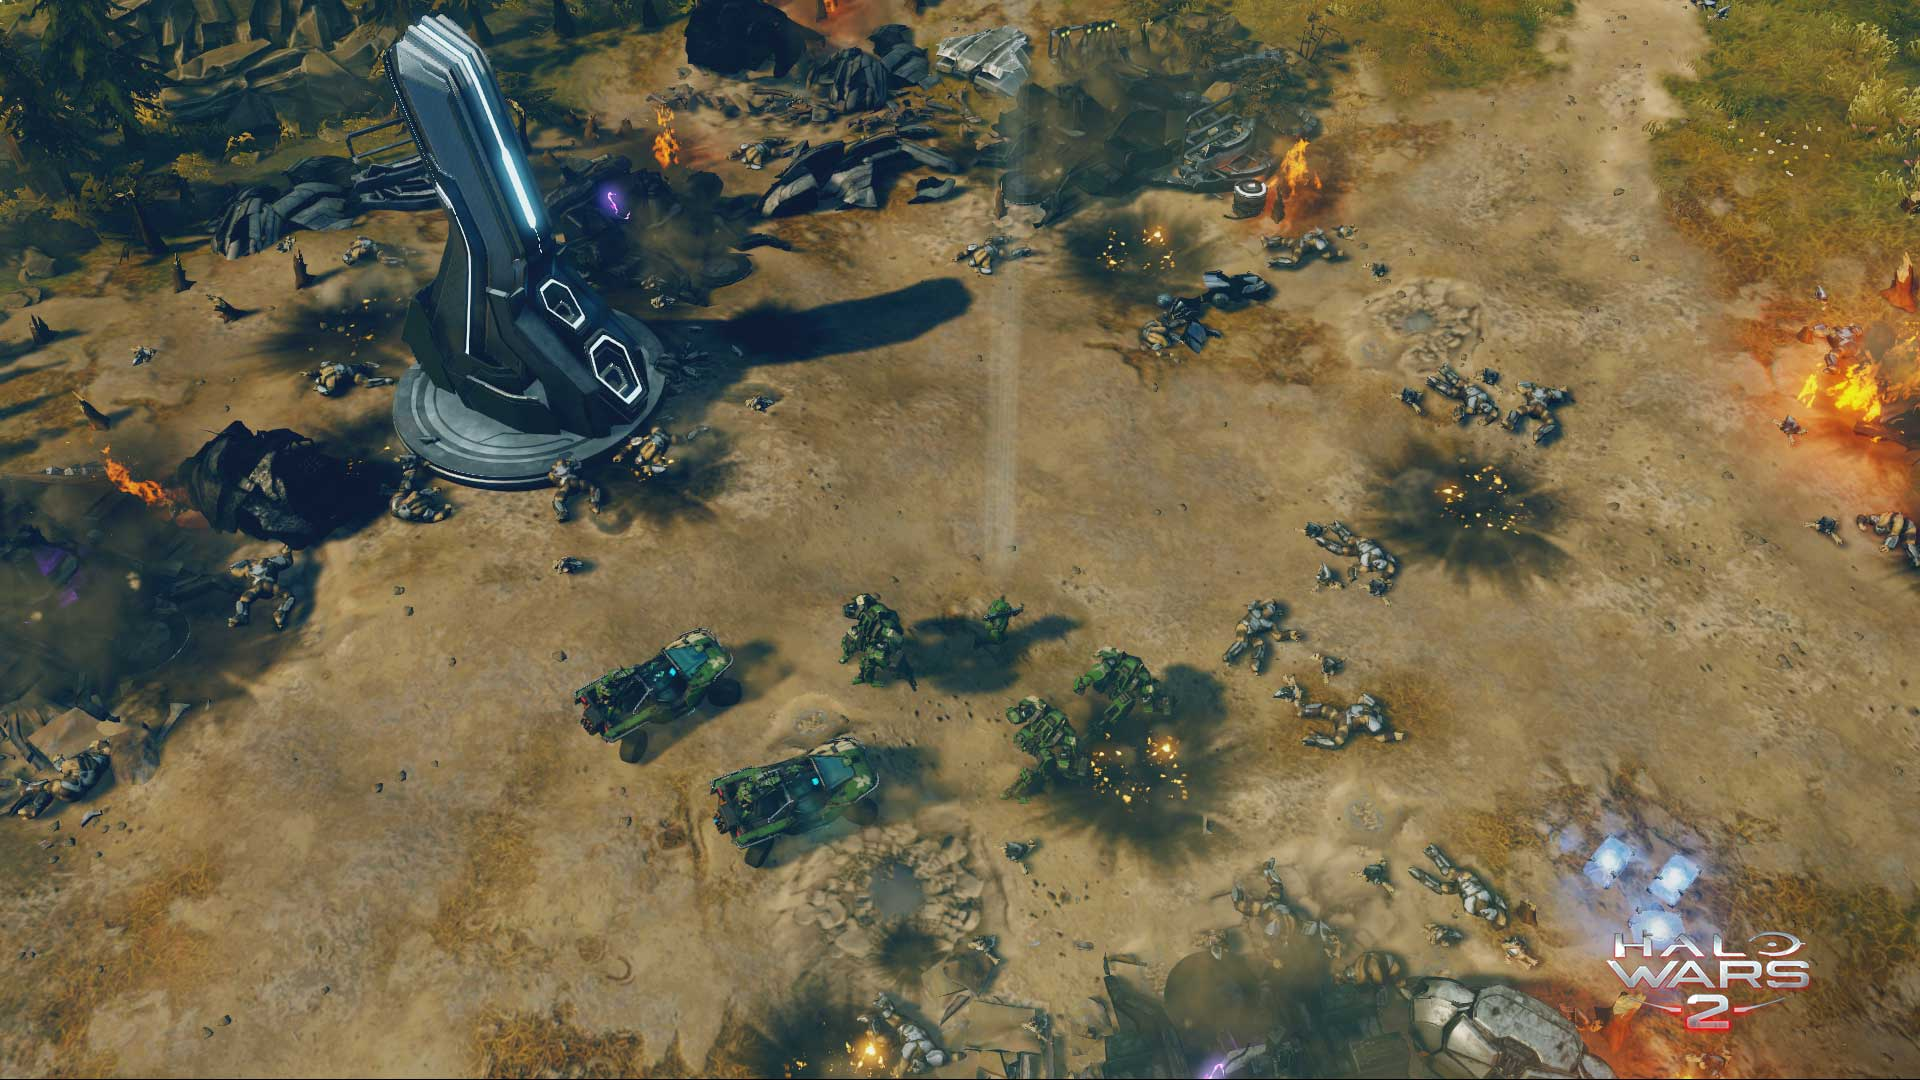 Destroyed Covenant base in Halo Wars 2